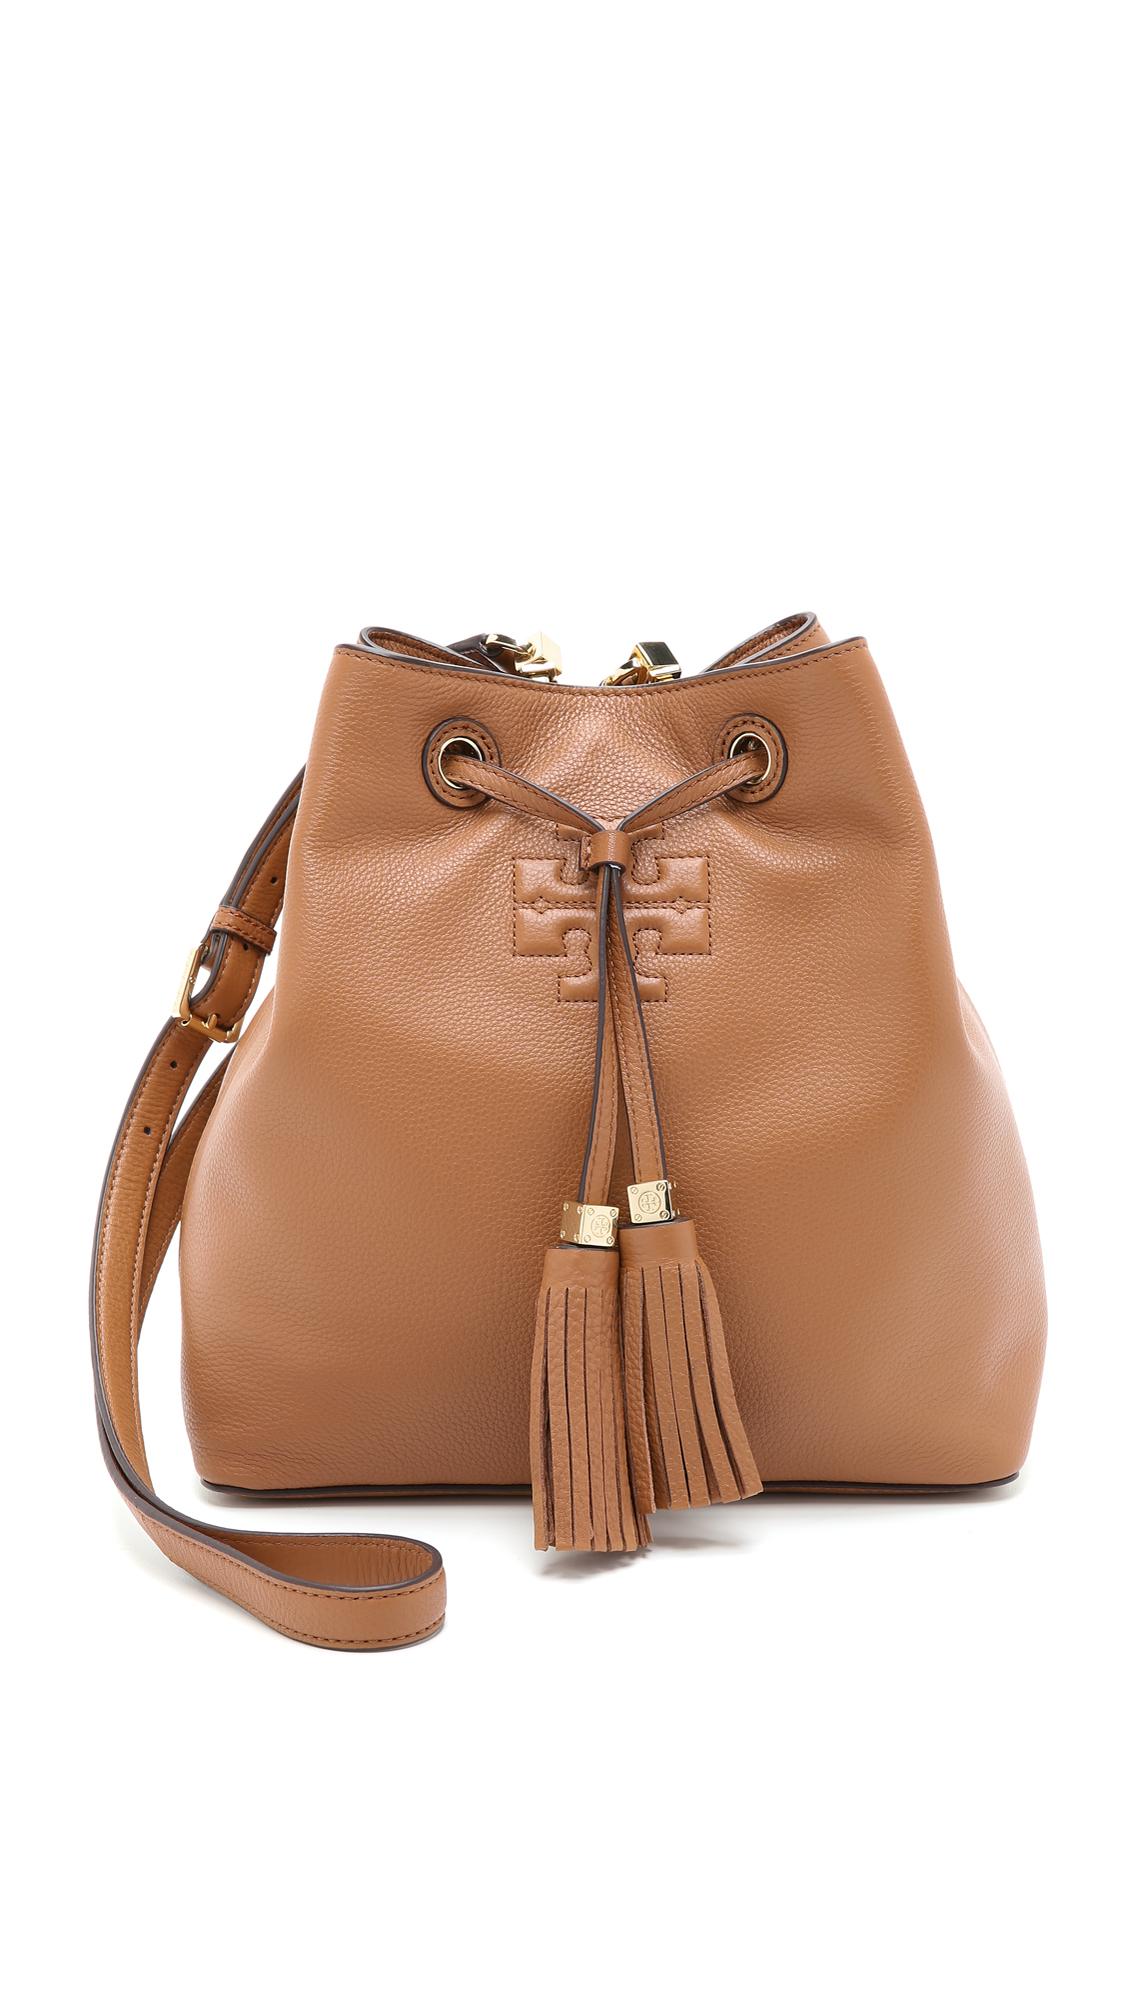 34173f20e594 Tory Burch Thea Bucket Bag - Bark in Brown - Lyst